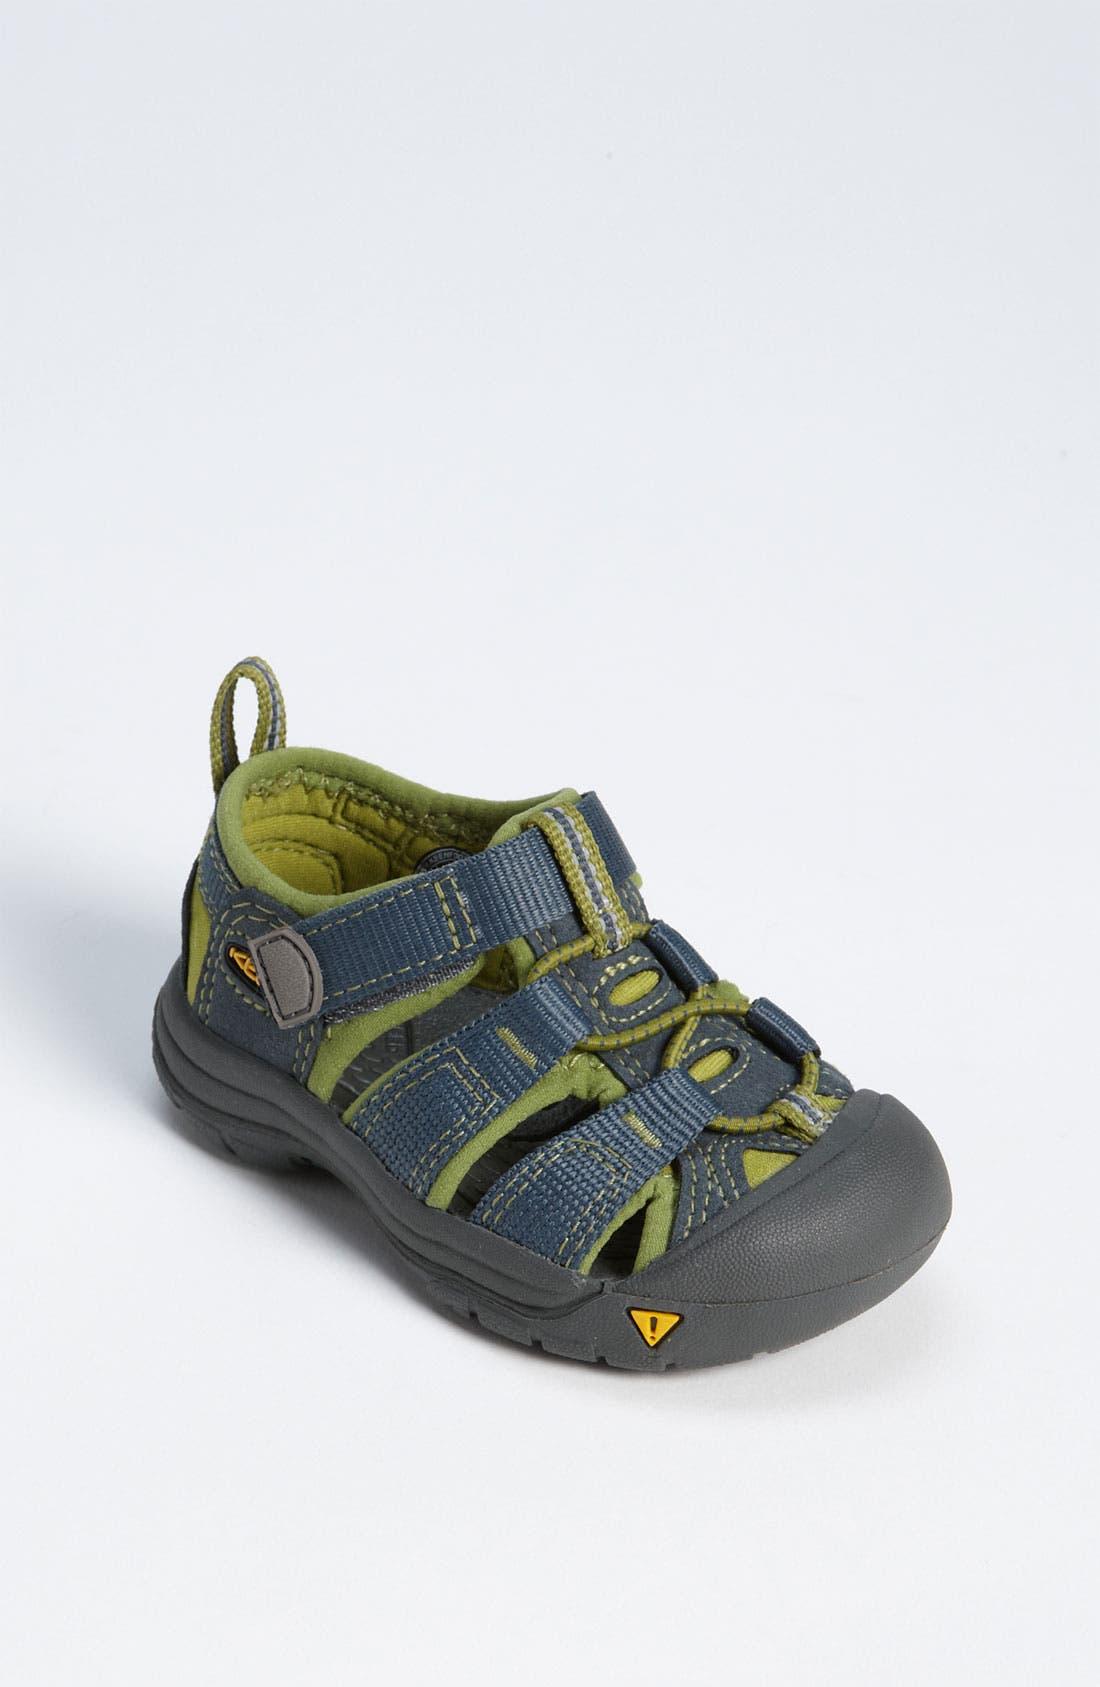 Alternate Image 1 Selected - Keen 'Newport H2' Sandal (Baby & Walker)